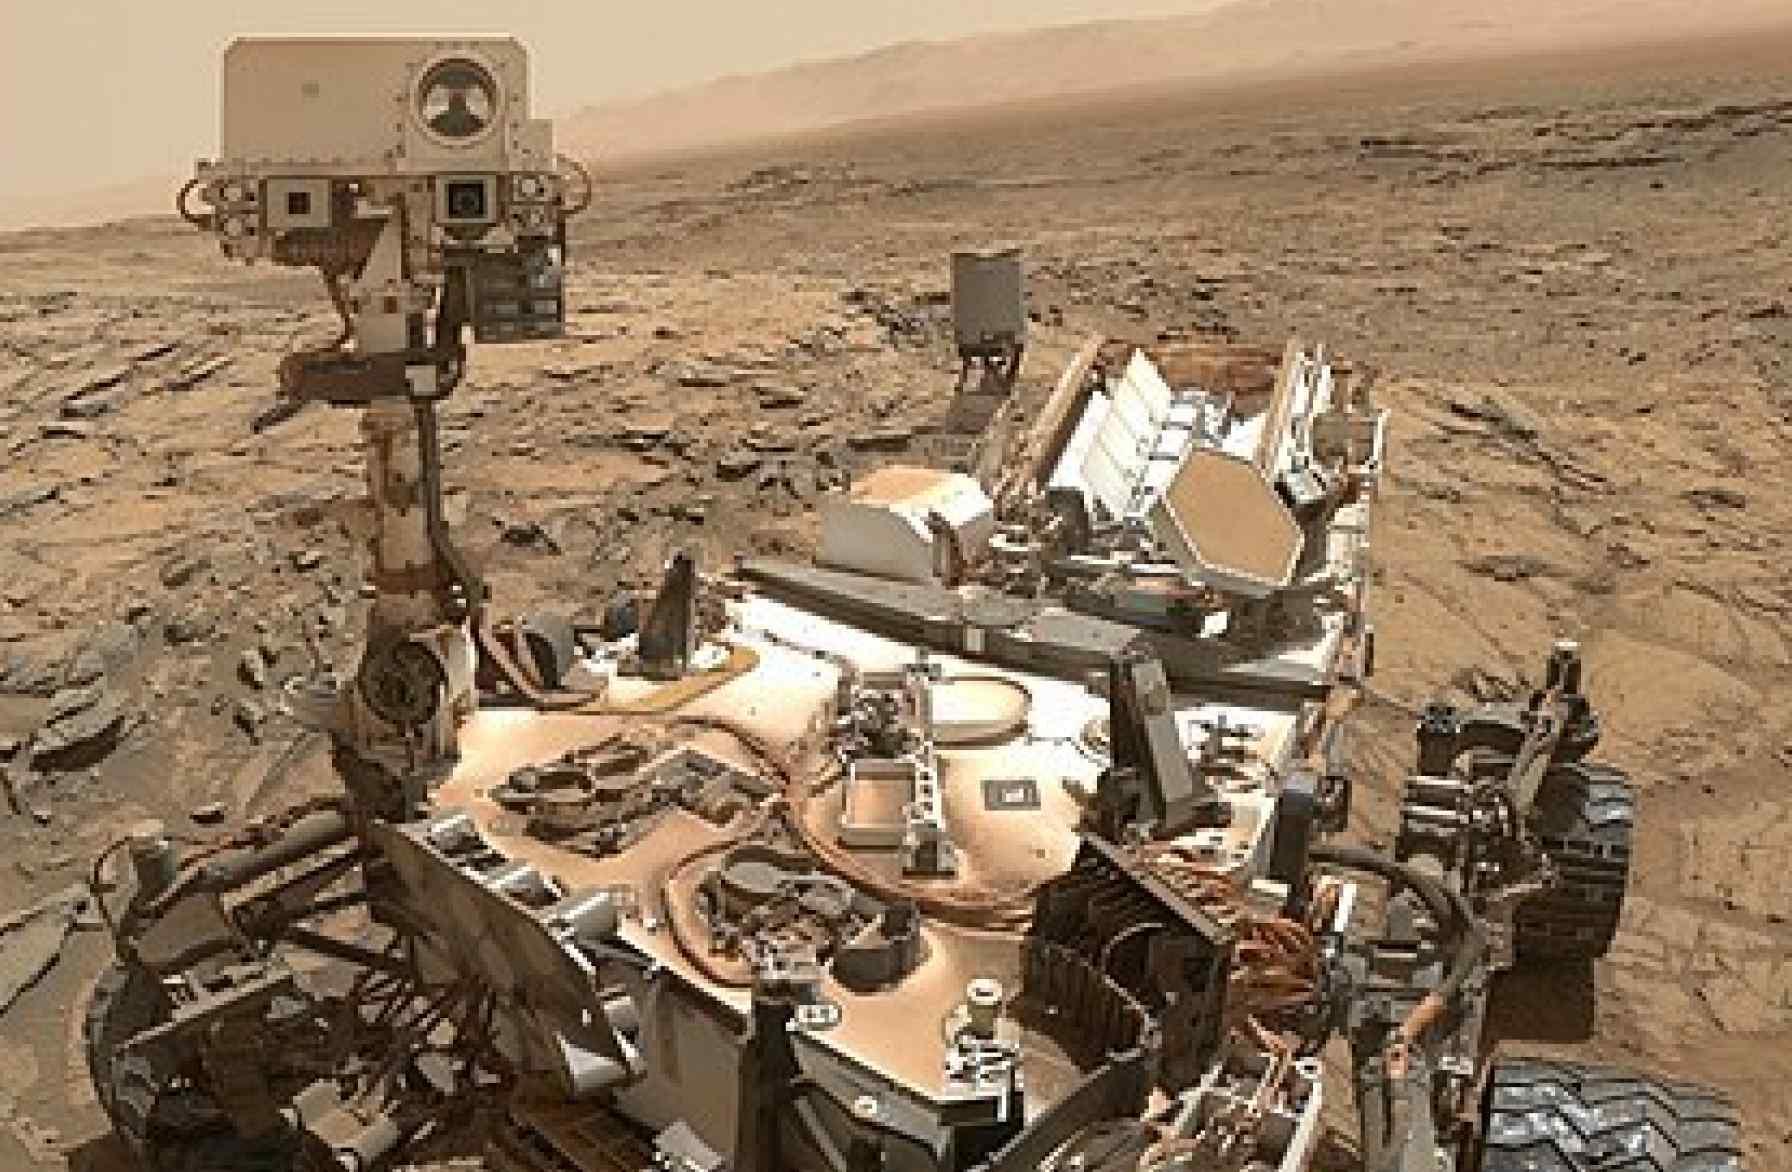 mars rover video - HD4474×2857